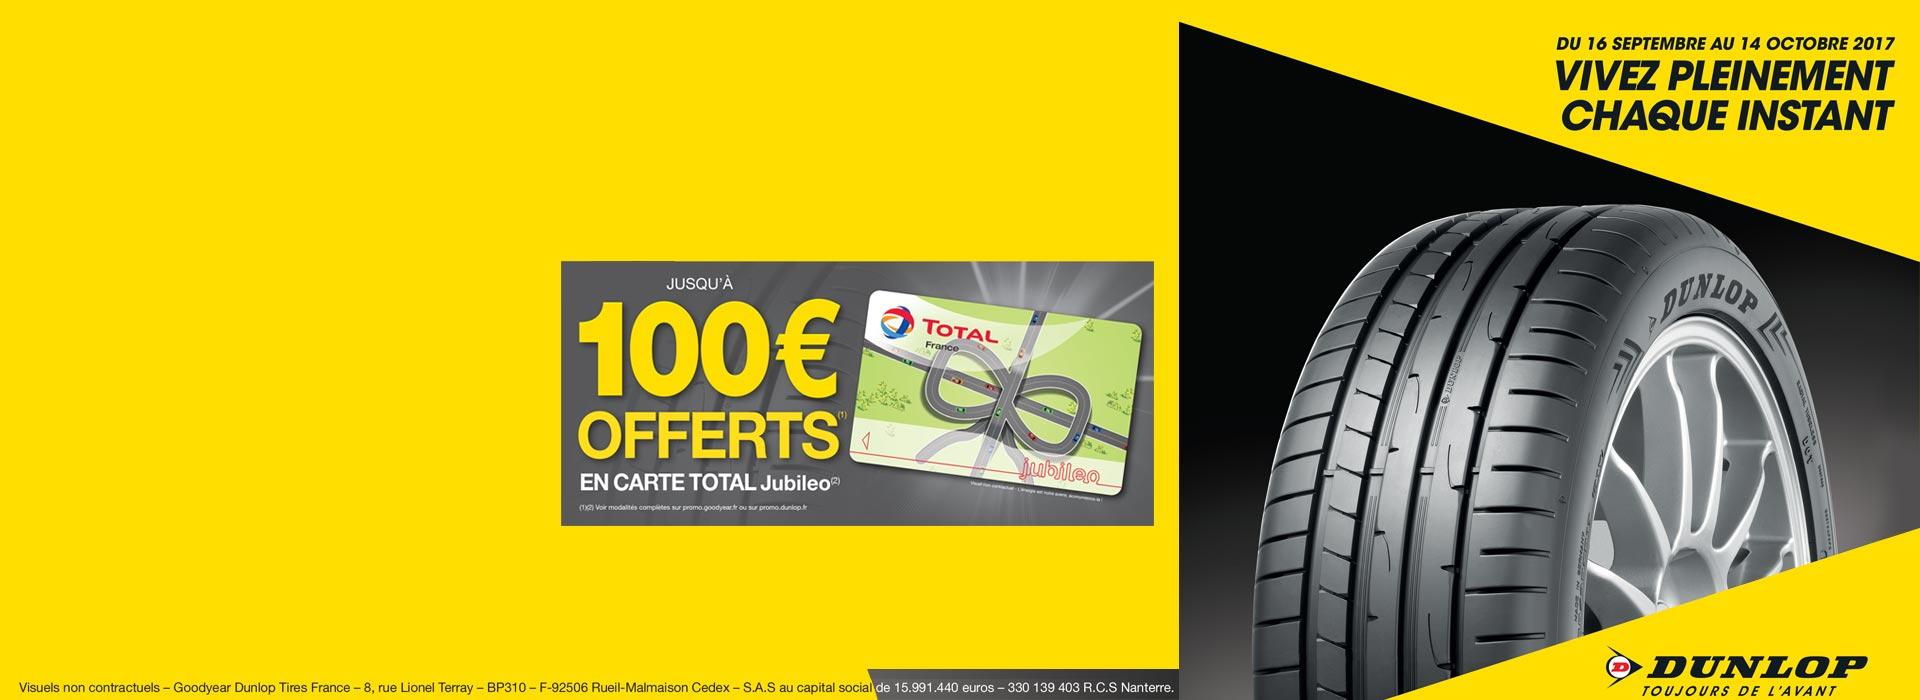 Renault albertville concessionnaire garage savoie 73 for Garage renault promotion pneus